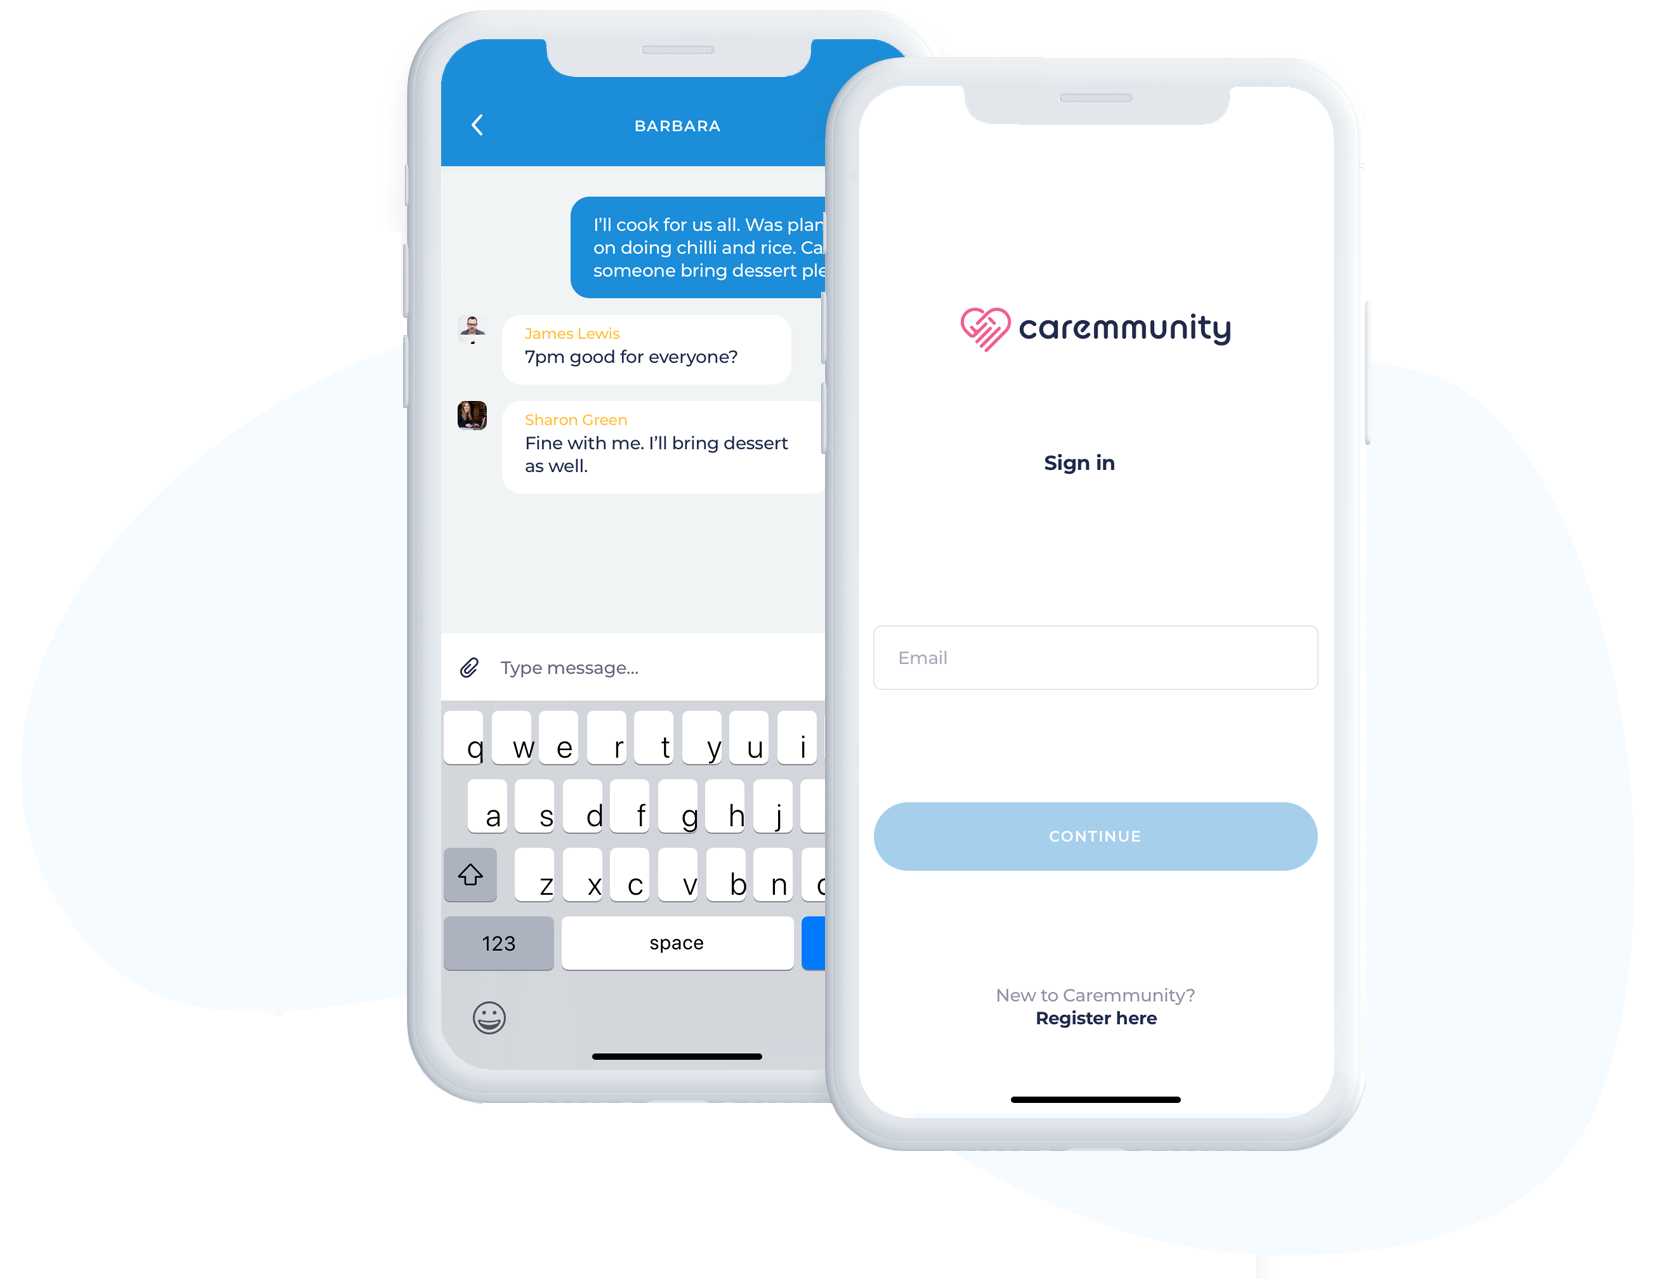 Screen shot of login screen and chat screen of Caremmunity app